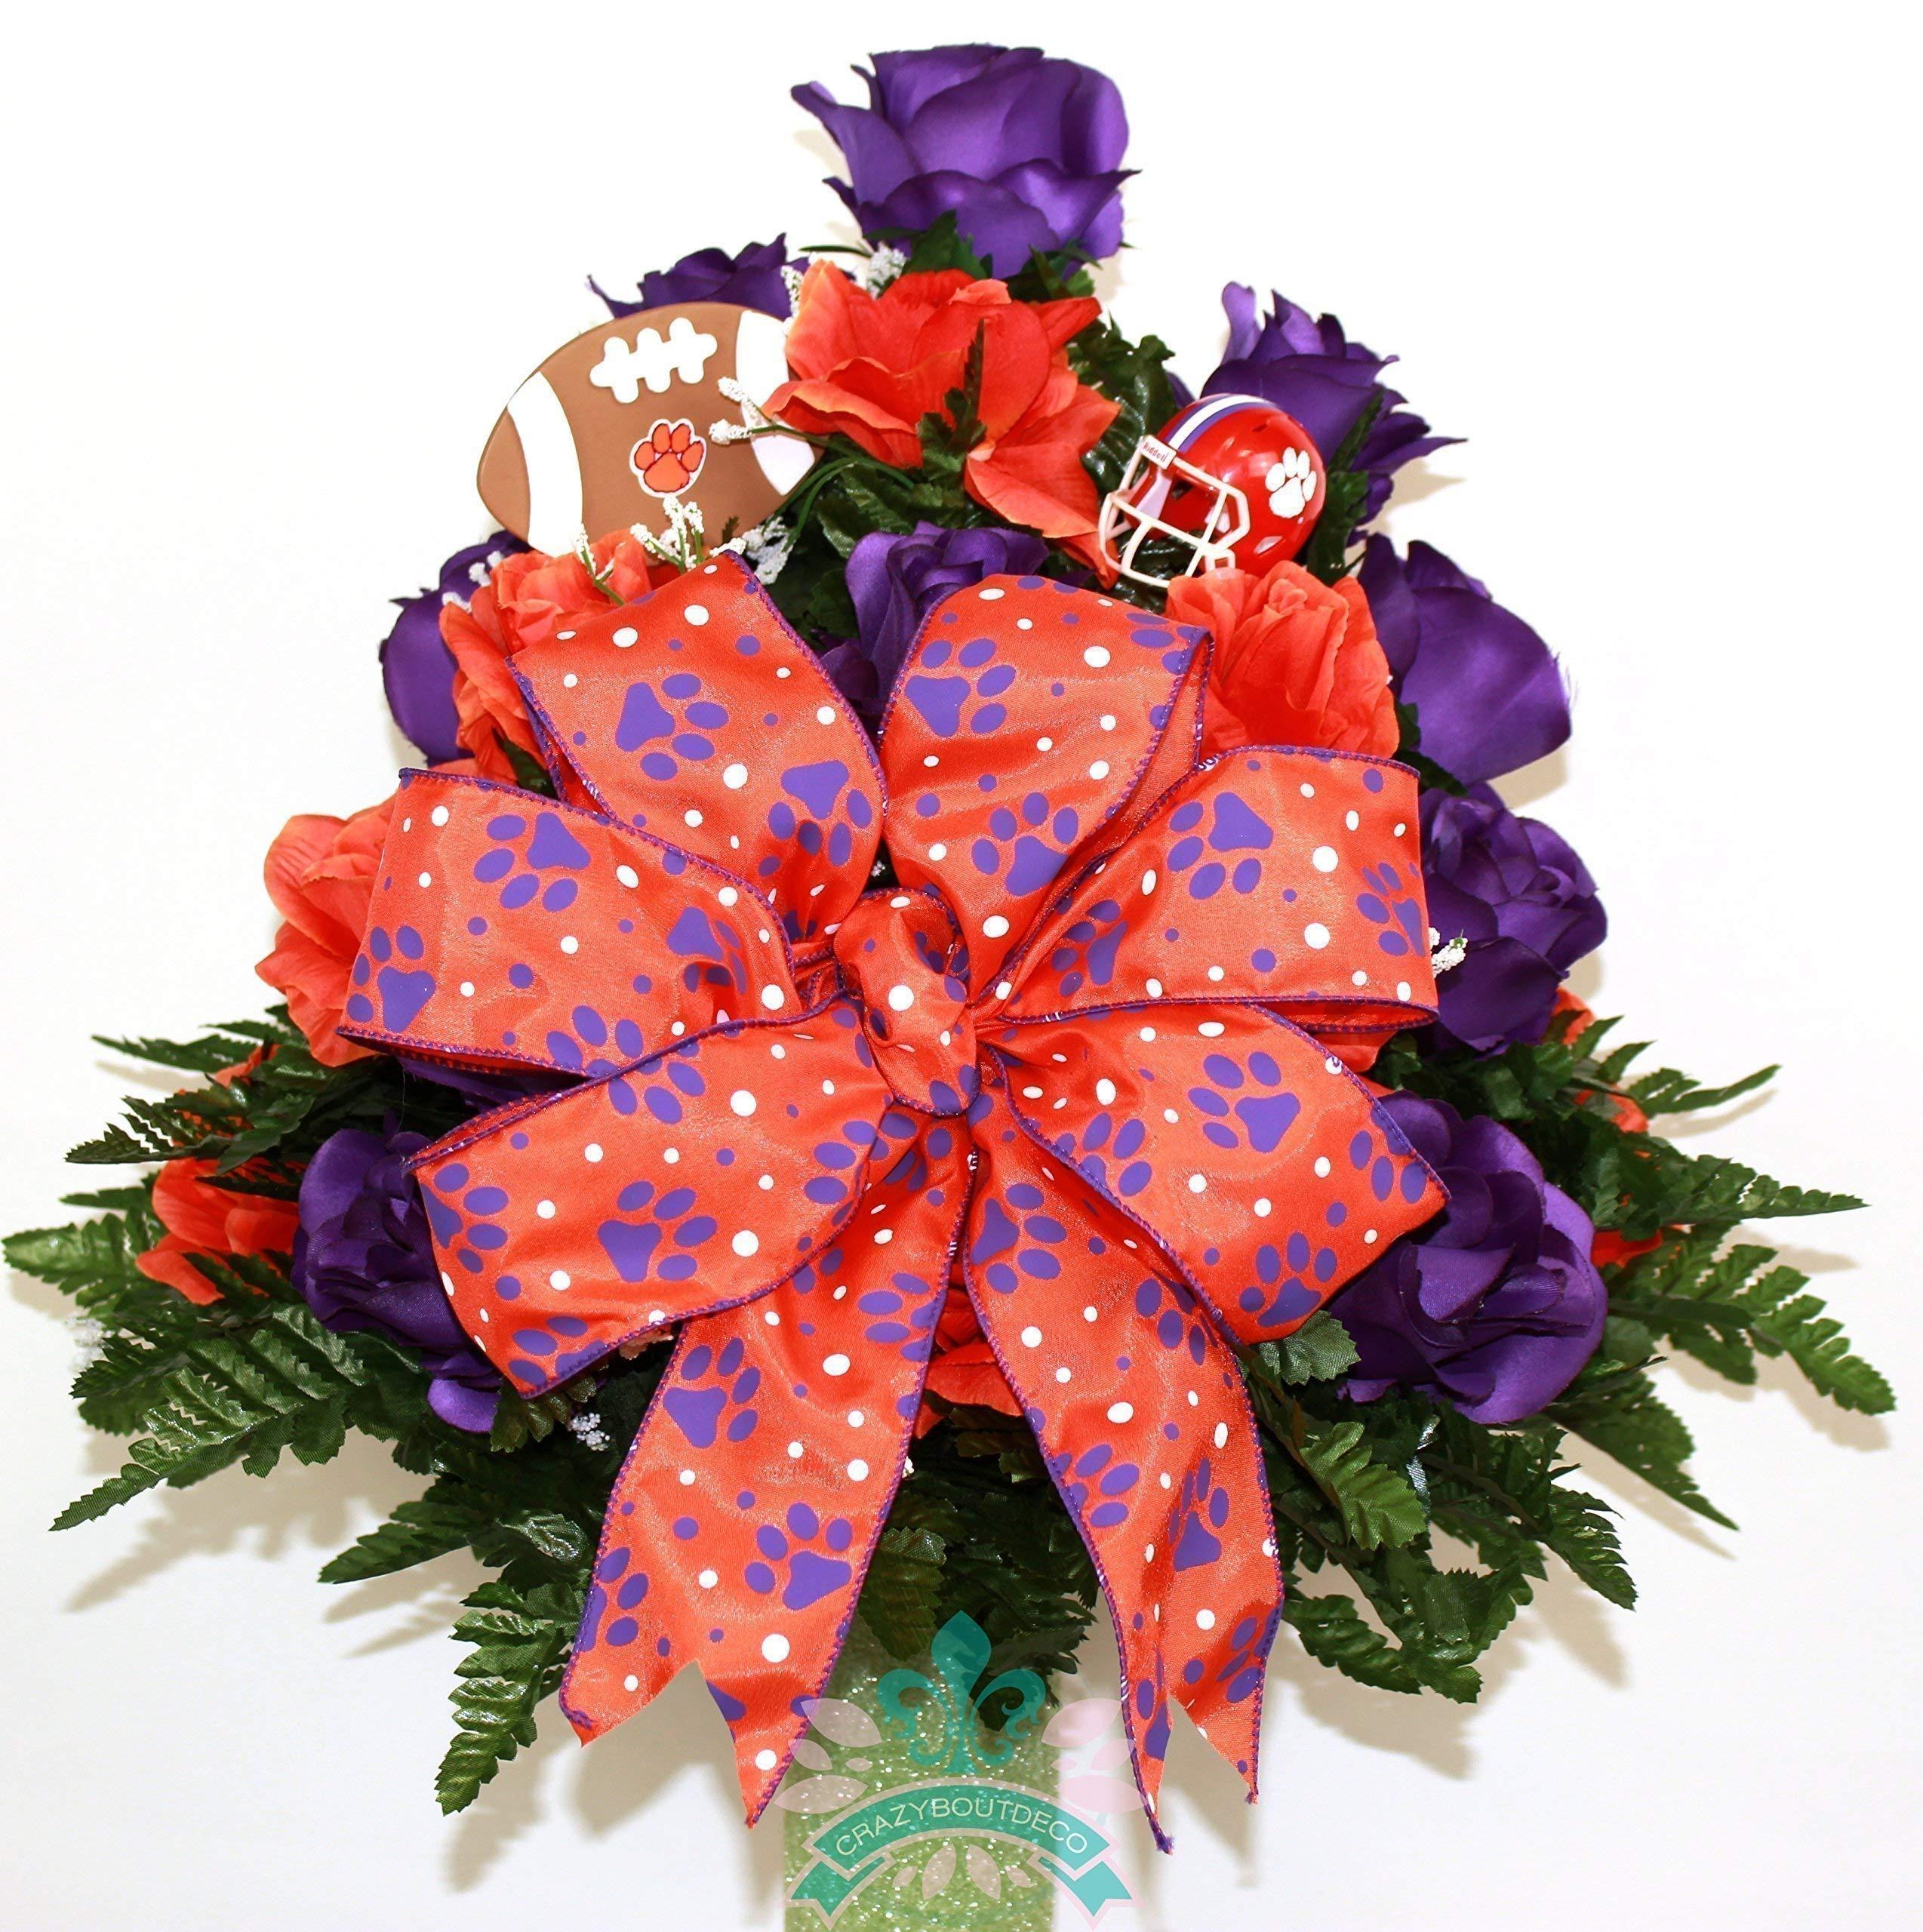 Clemson-Tiger-Fan-Cemetery-Vase-Arrangement-featuring-OrangePurple-Roses